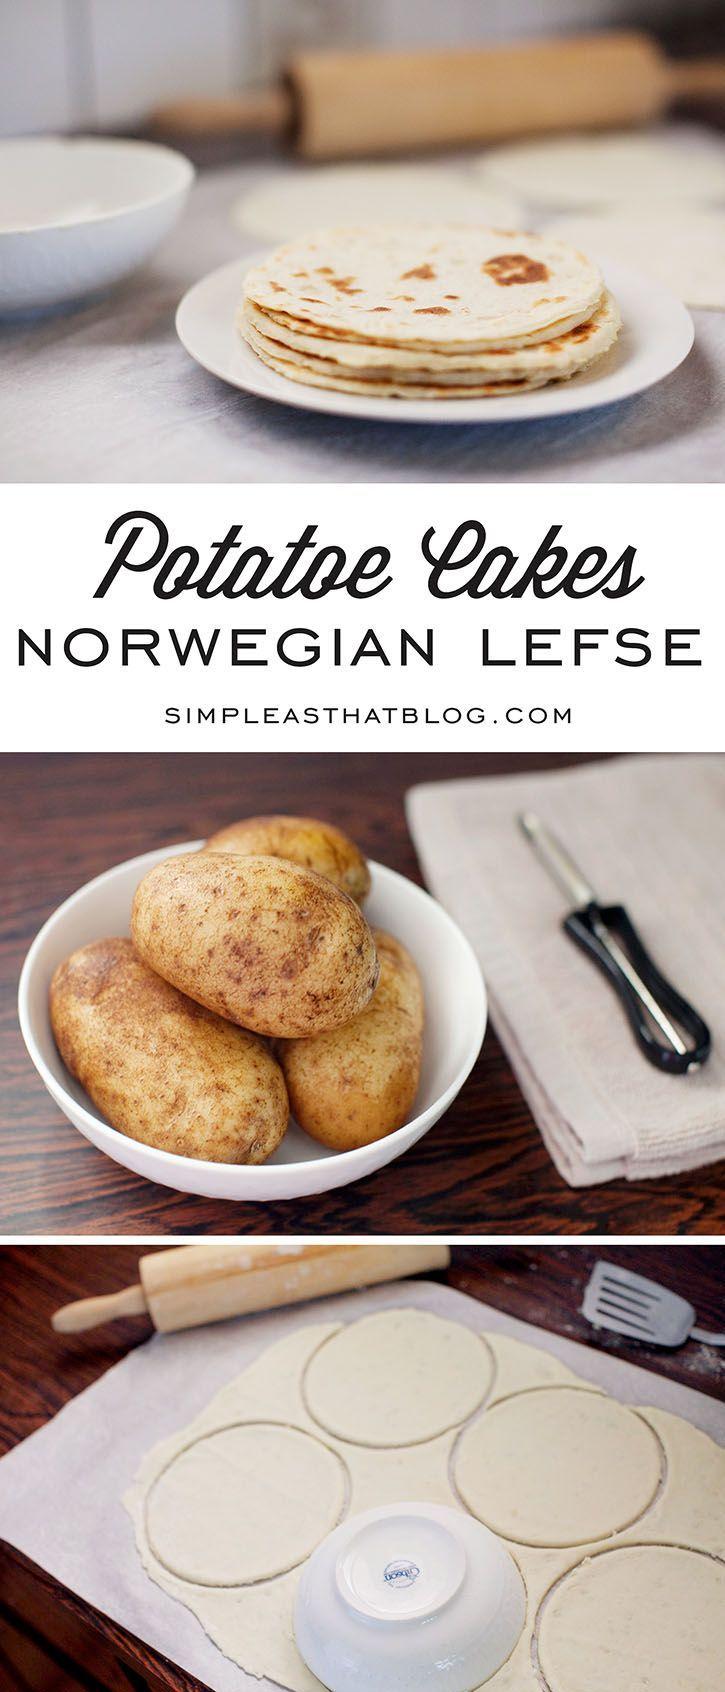 Traditional Norwegian Lefse or Potato Cake